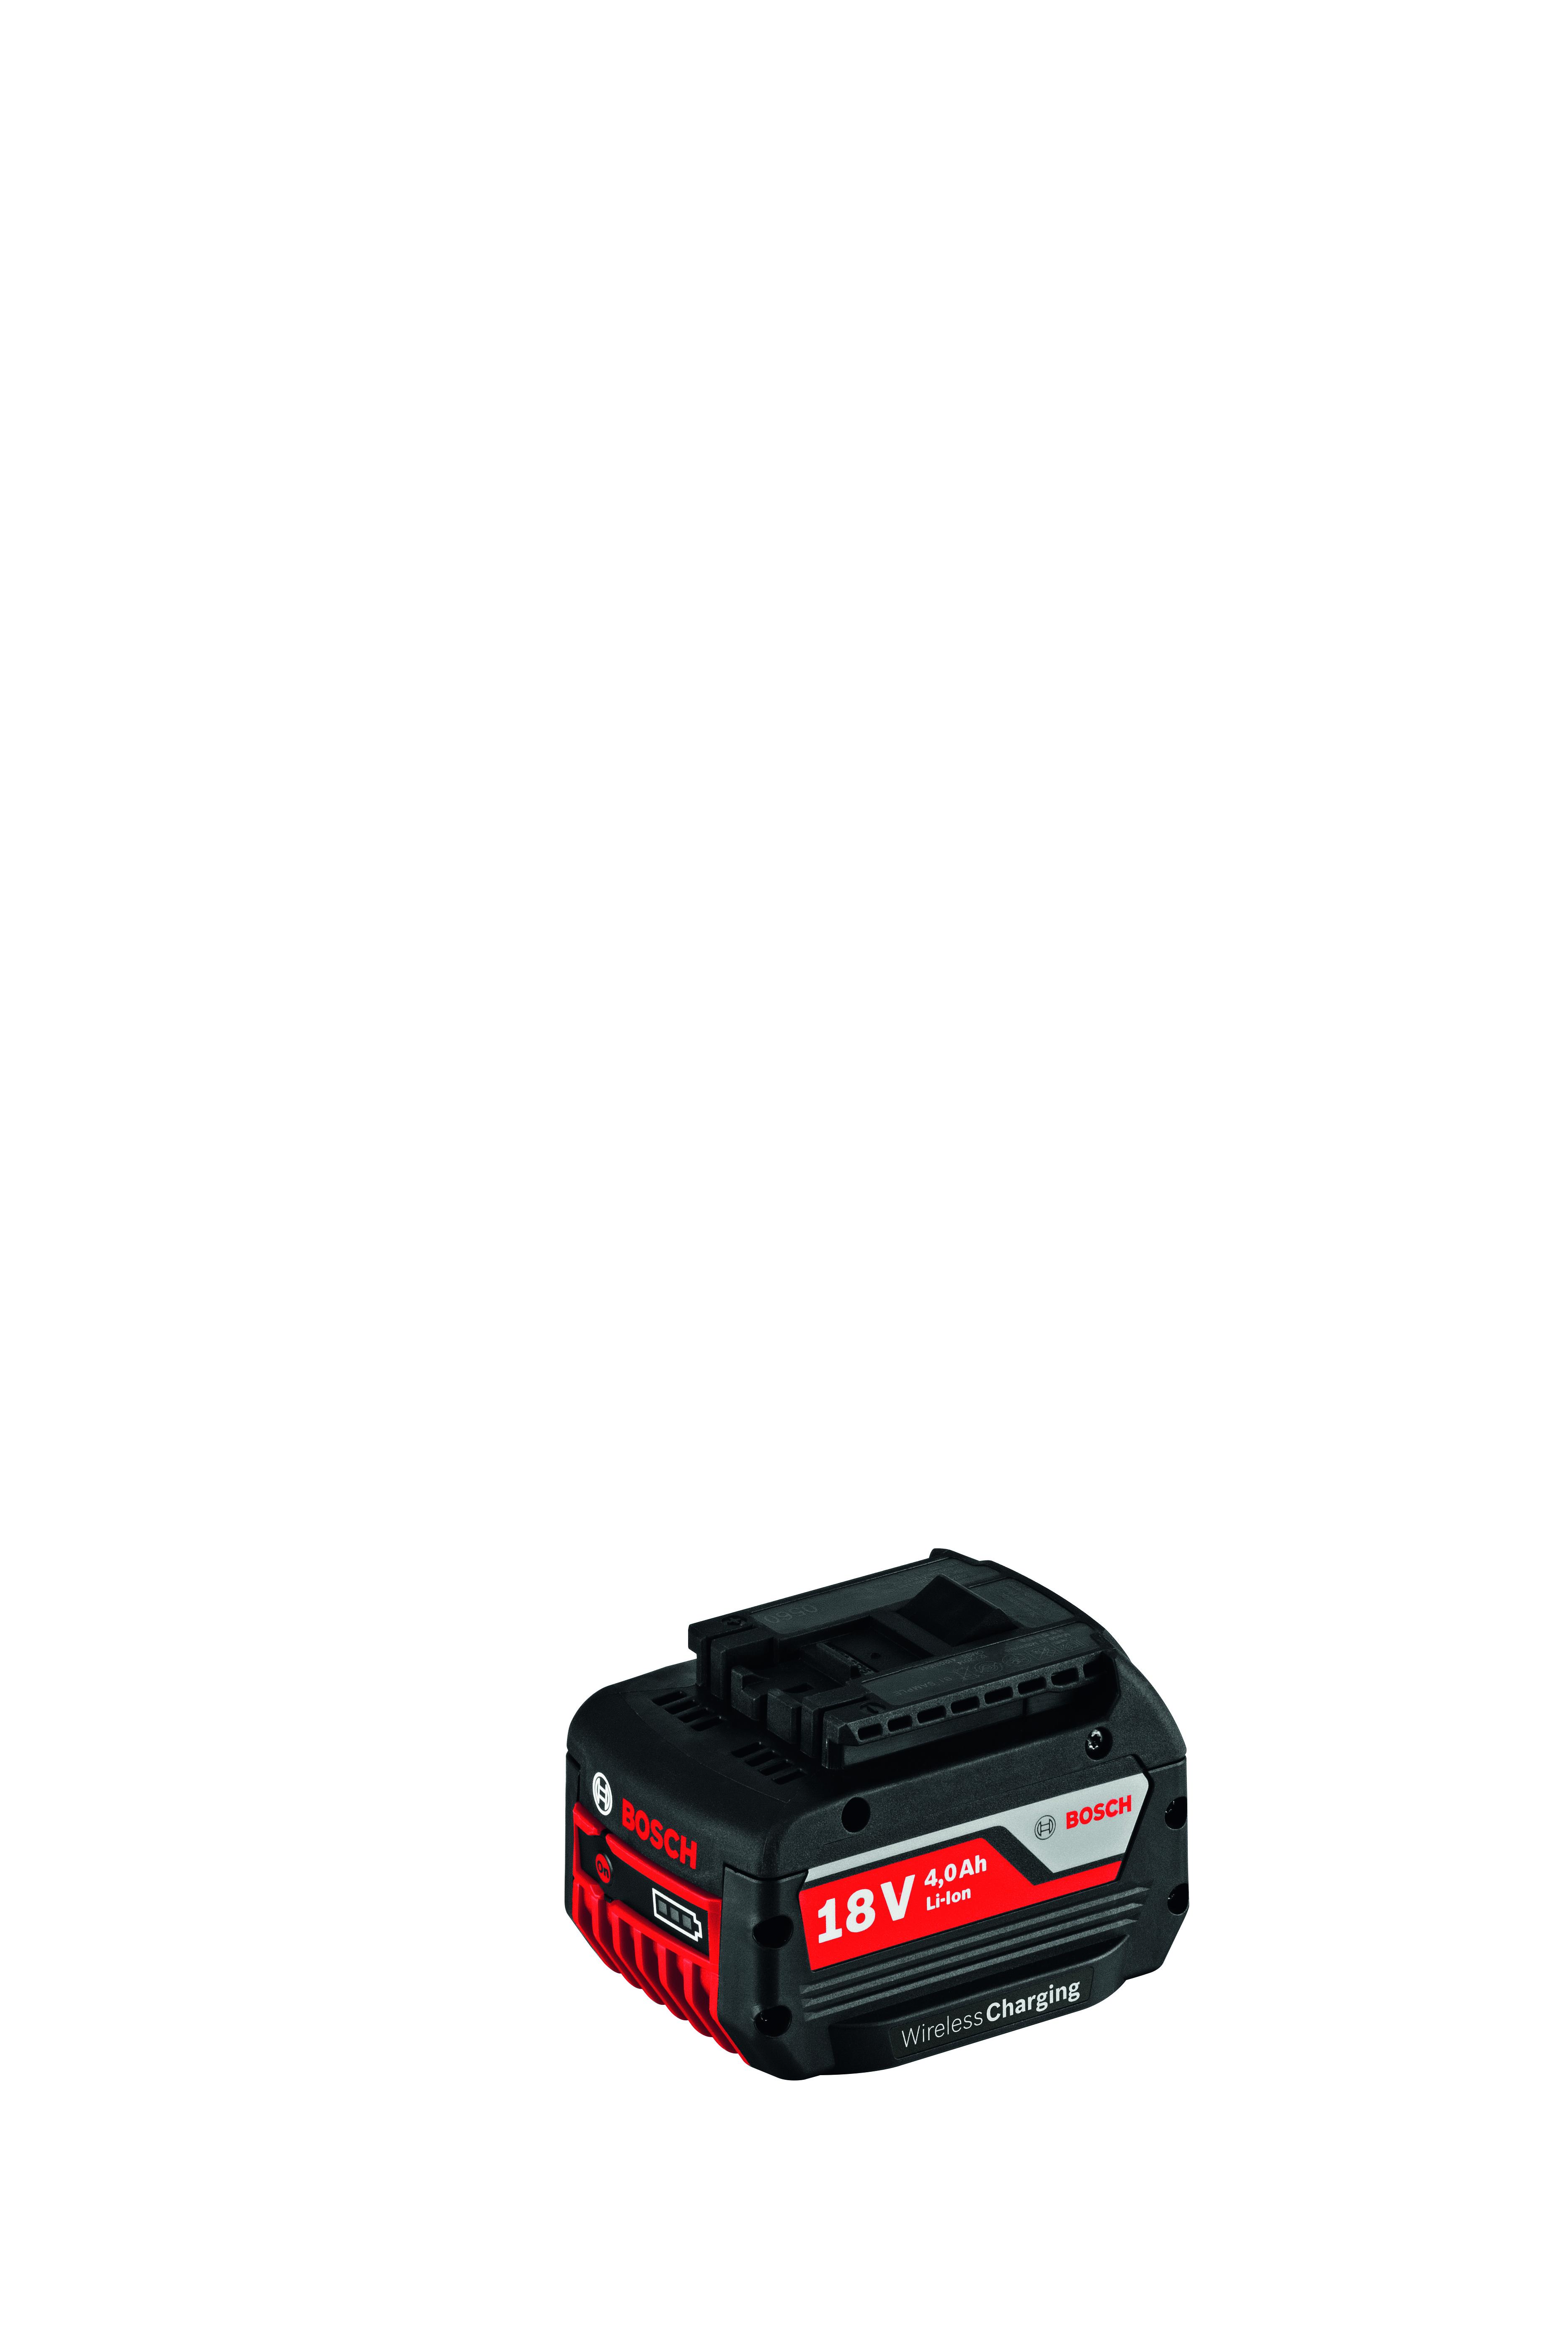 Image of   GBA 18 V 4,0 Ah W Wireless Charging Wireless Charging akku GBA 18 V 4,0 Ah W Professional